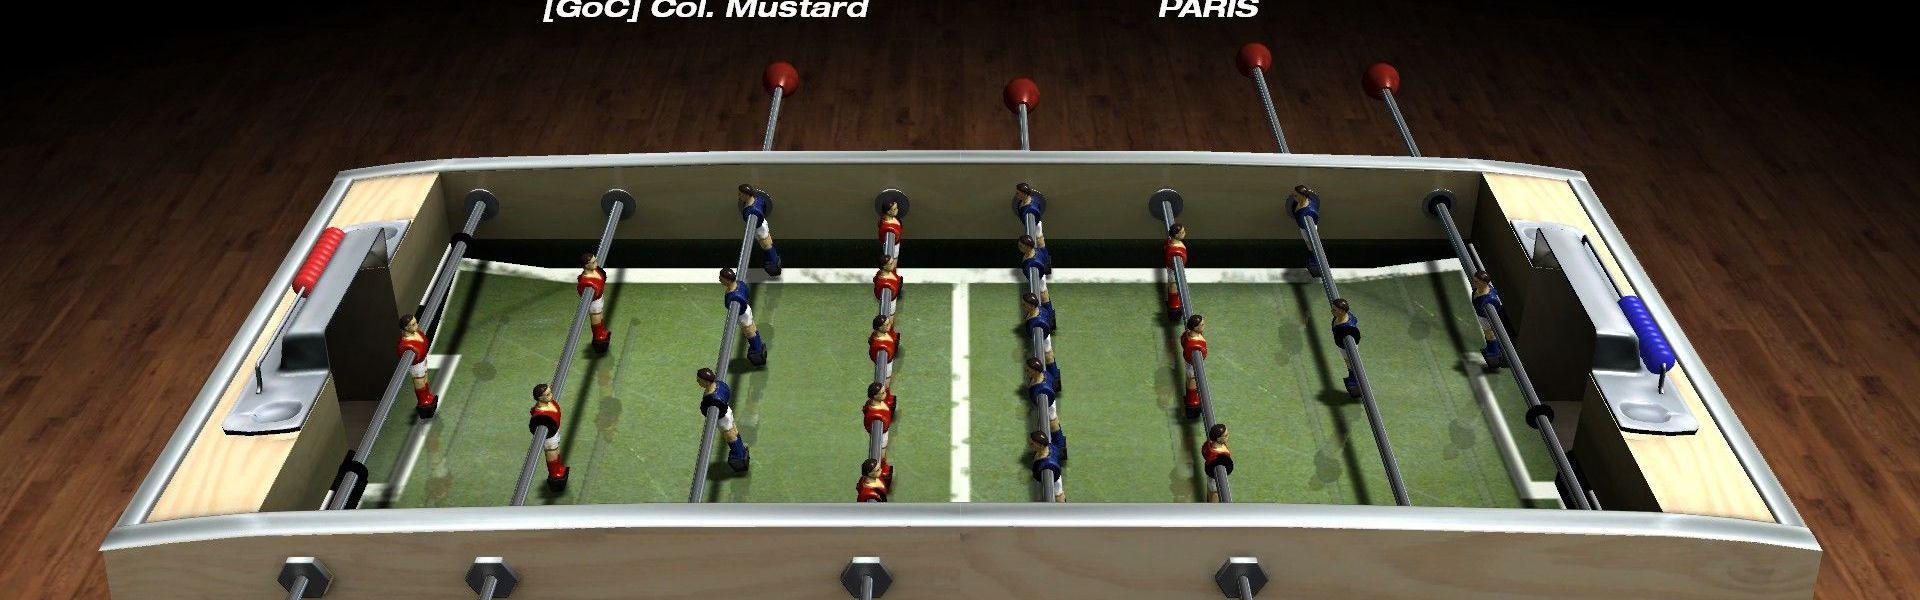 Foosball: World Tour Steam Key GLOBAL